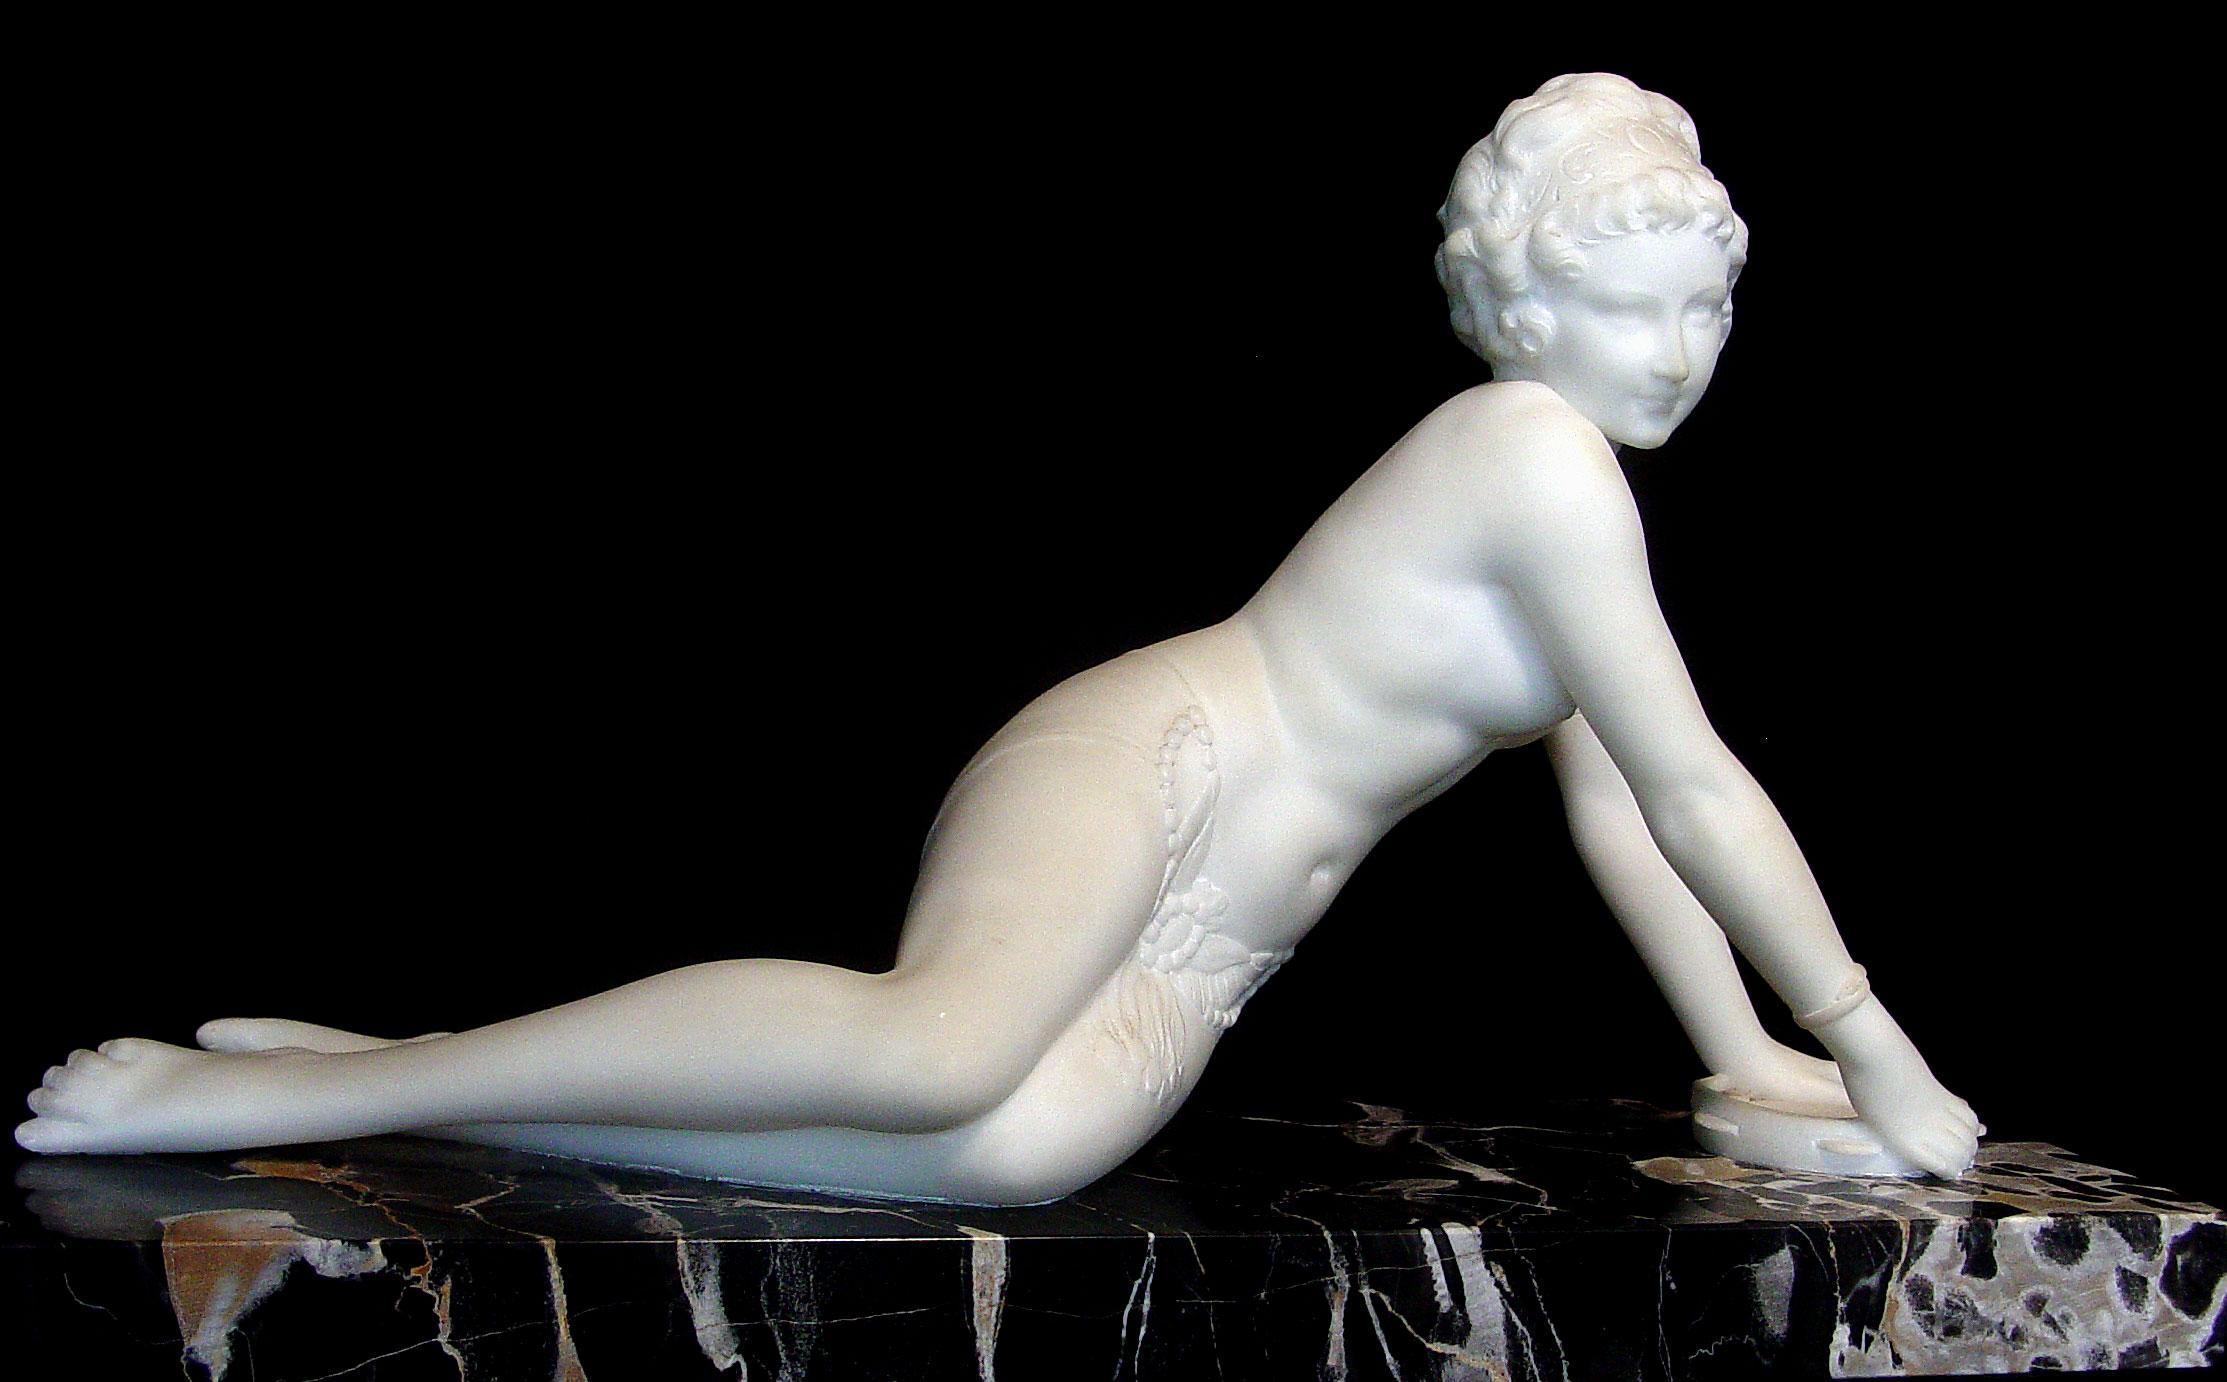 Western human stone sculpture, nude man woman statue, garden white marble sculpture